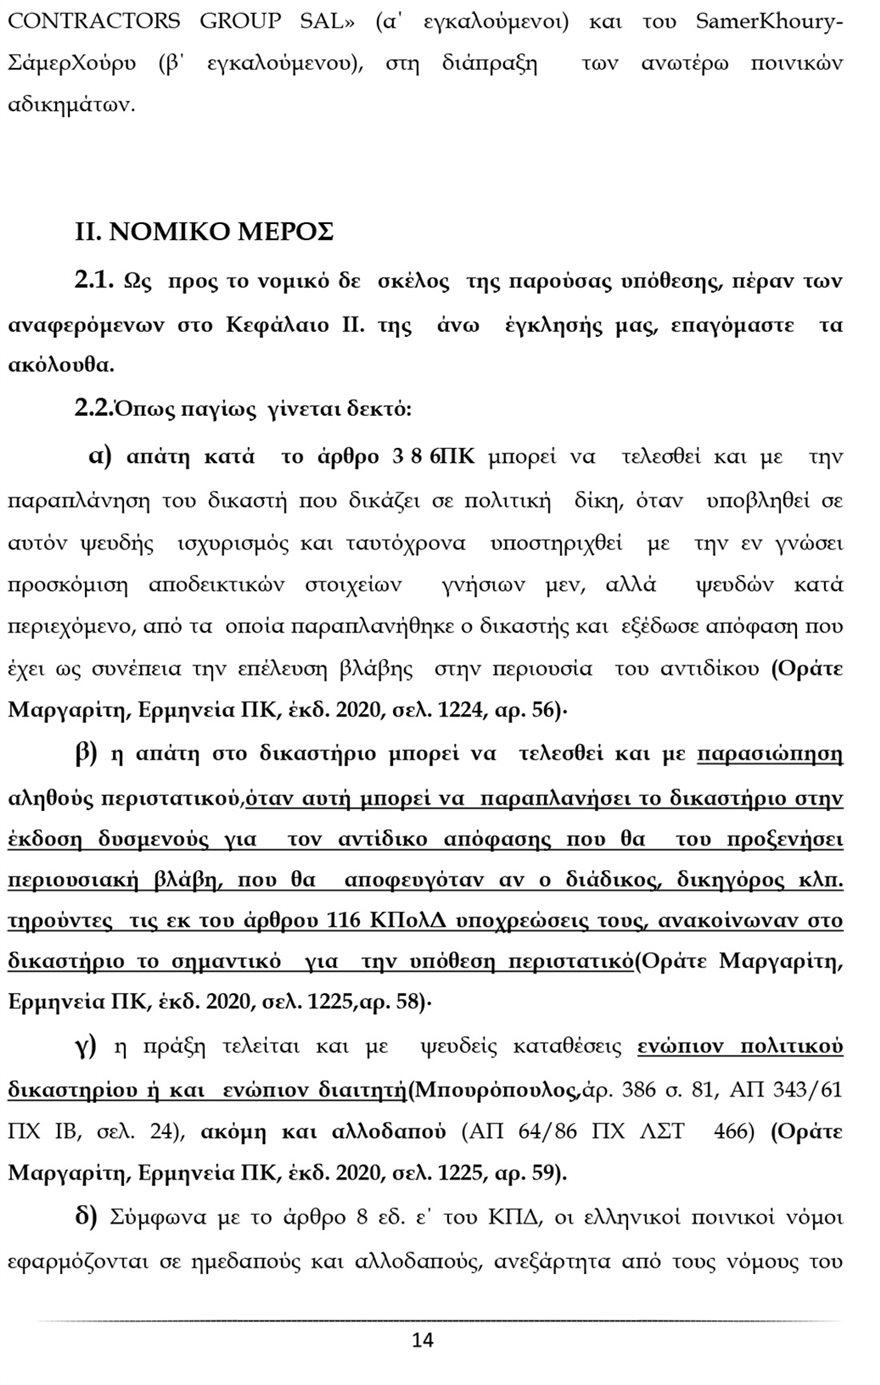 ypomnima-14